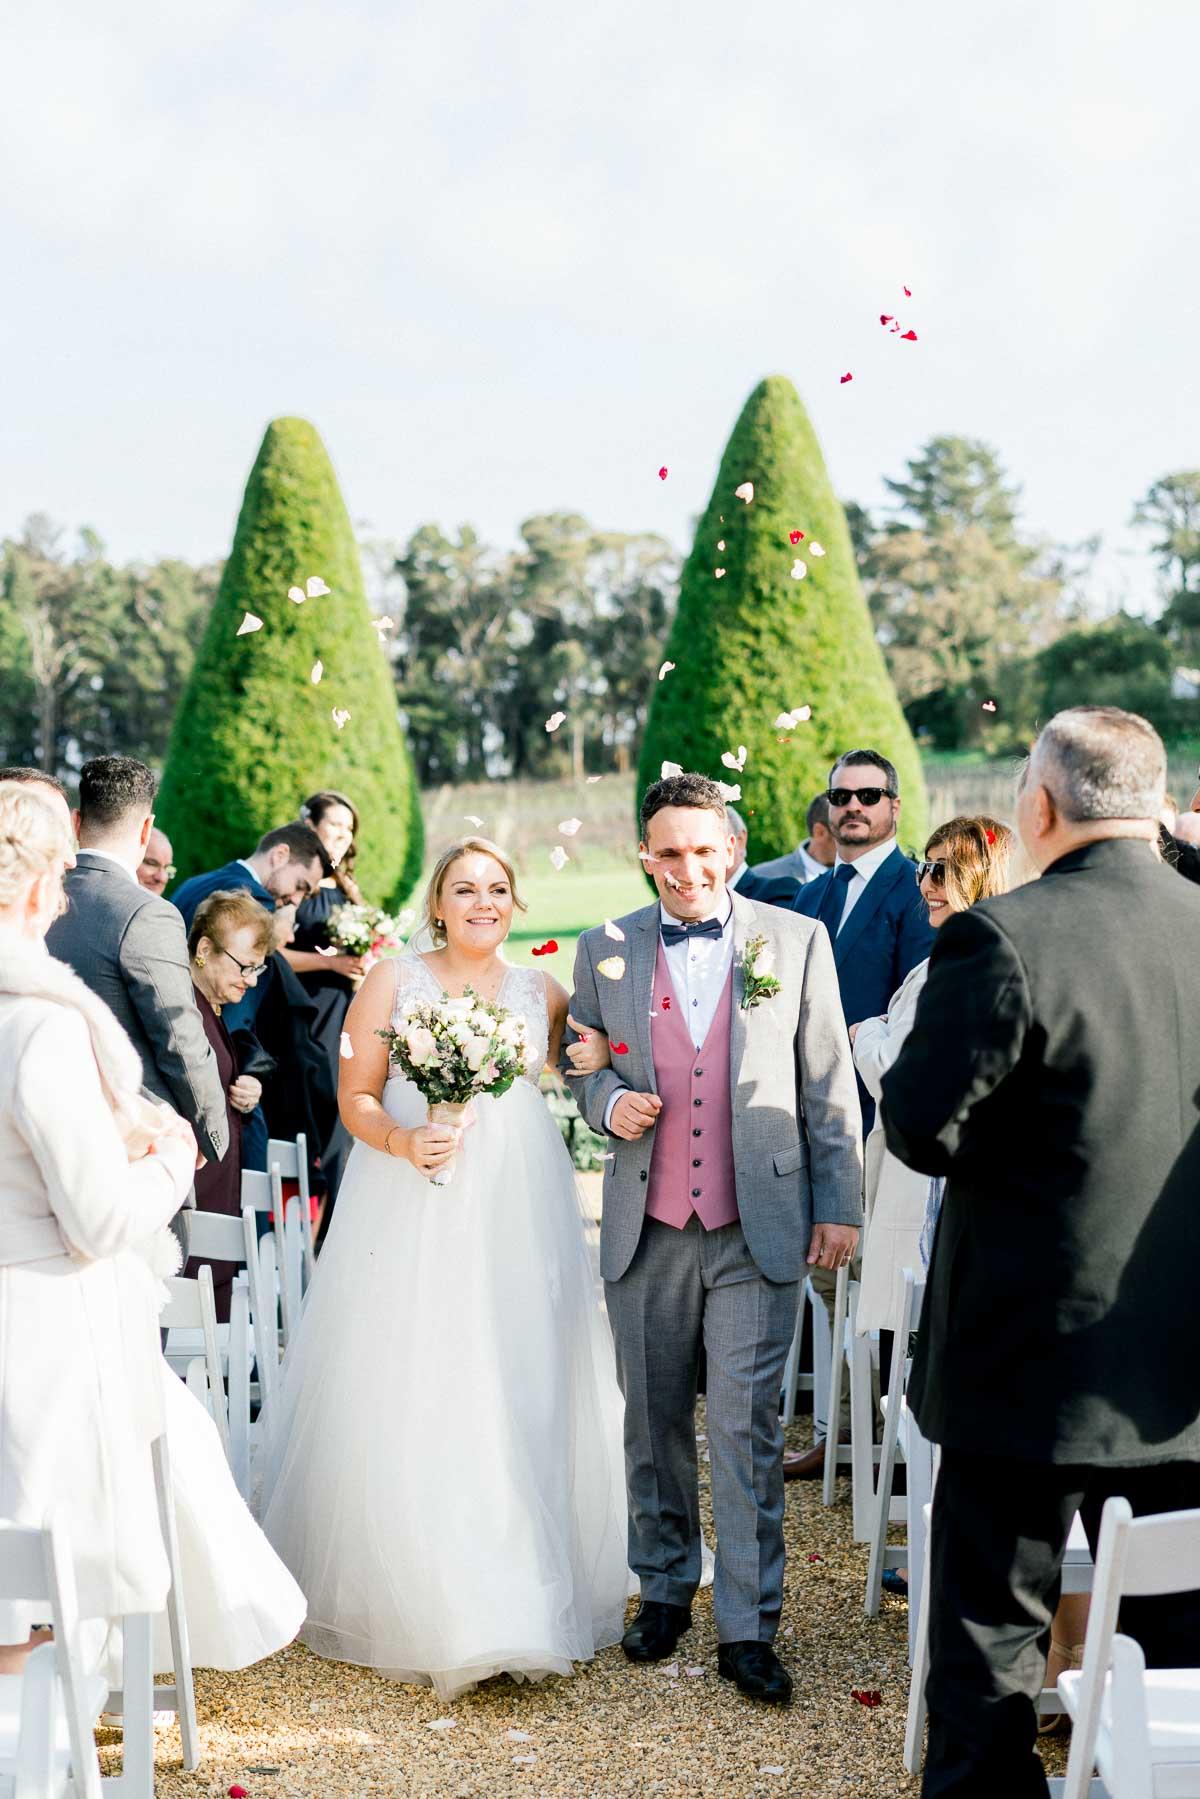 lindenderry-wedding-heart+soul-weddings-amy-alain-03456.jpg